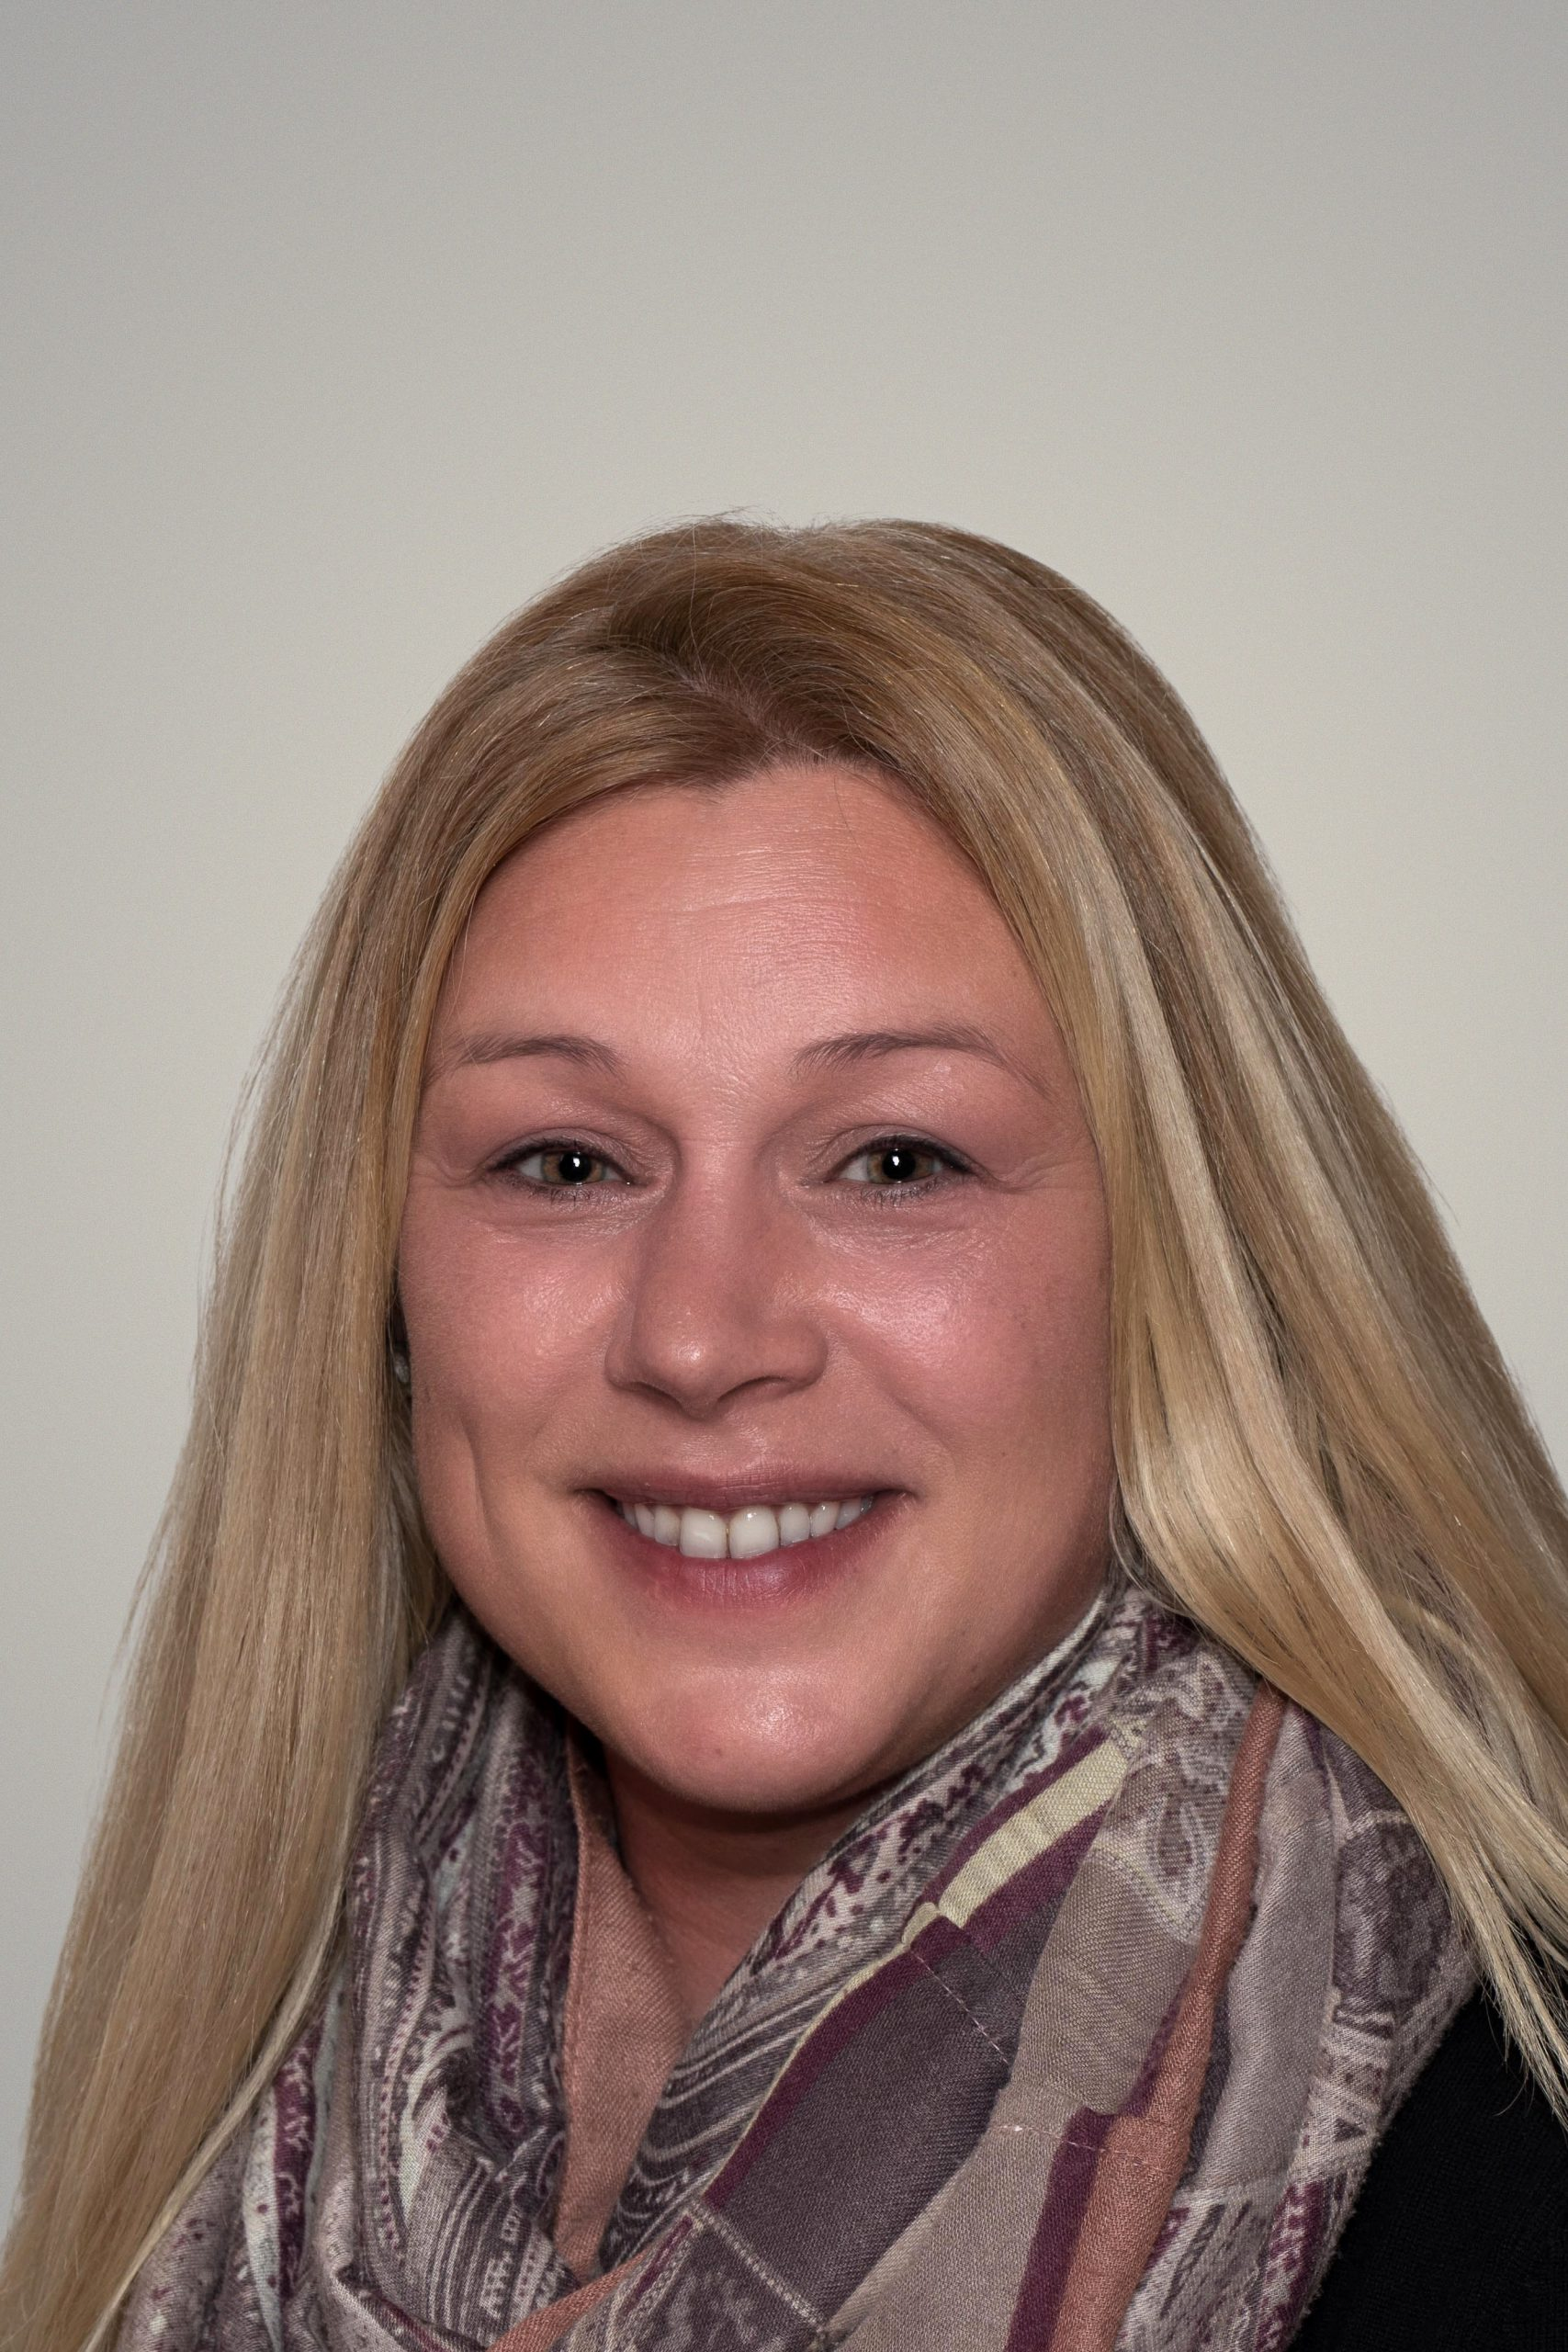 Sonja Pinhart